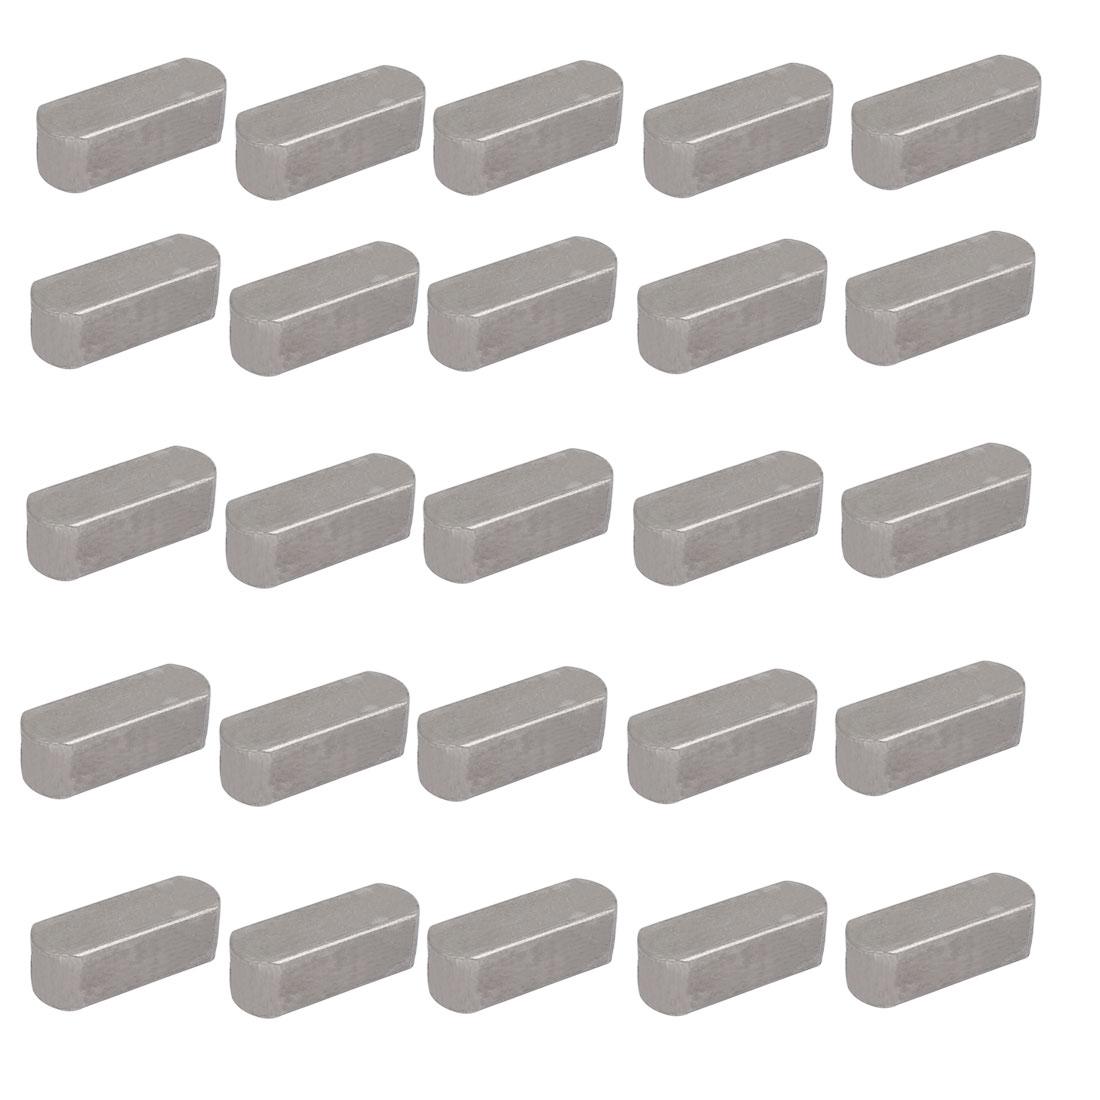 22mmx8mmx7mm Carbon Steel Key Stock To Lock Pulleys 25pcs